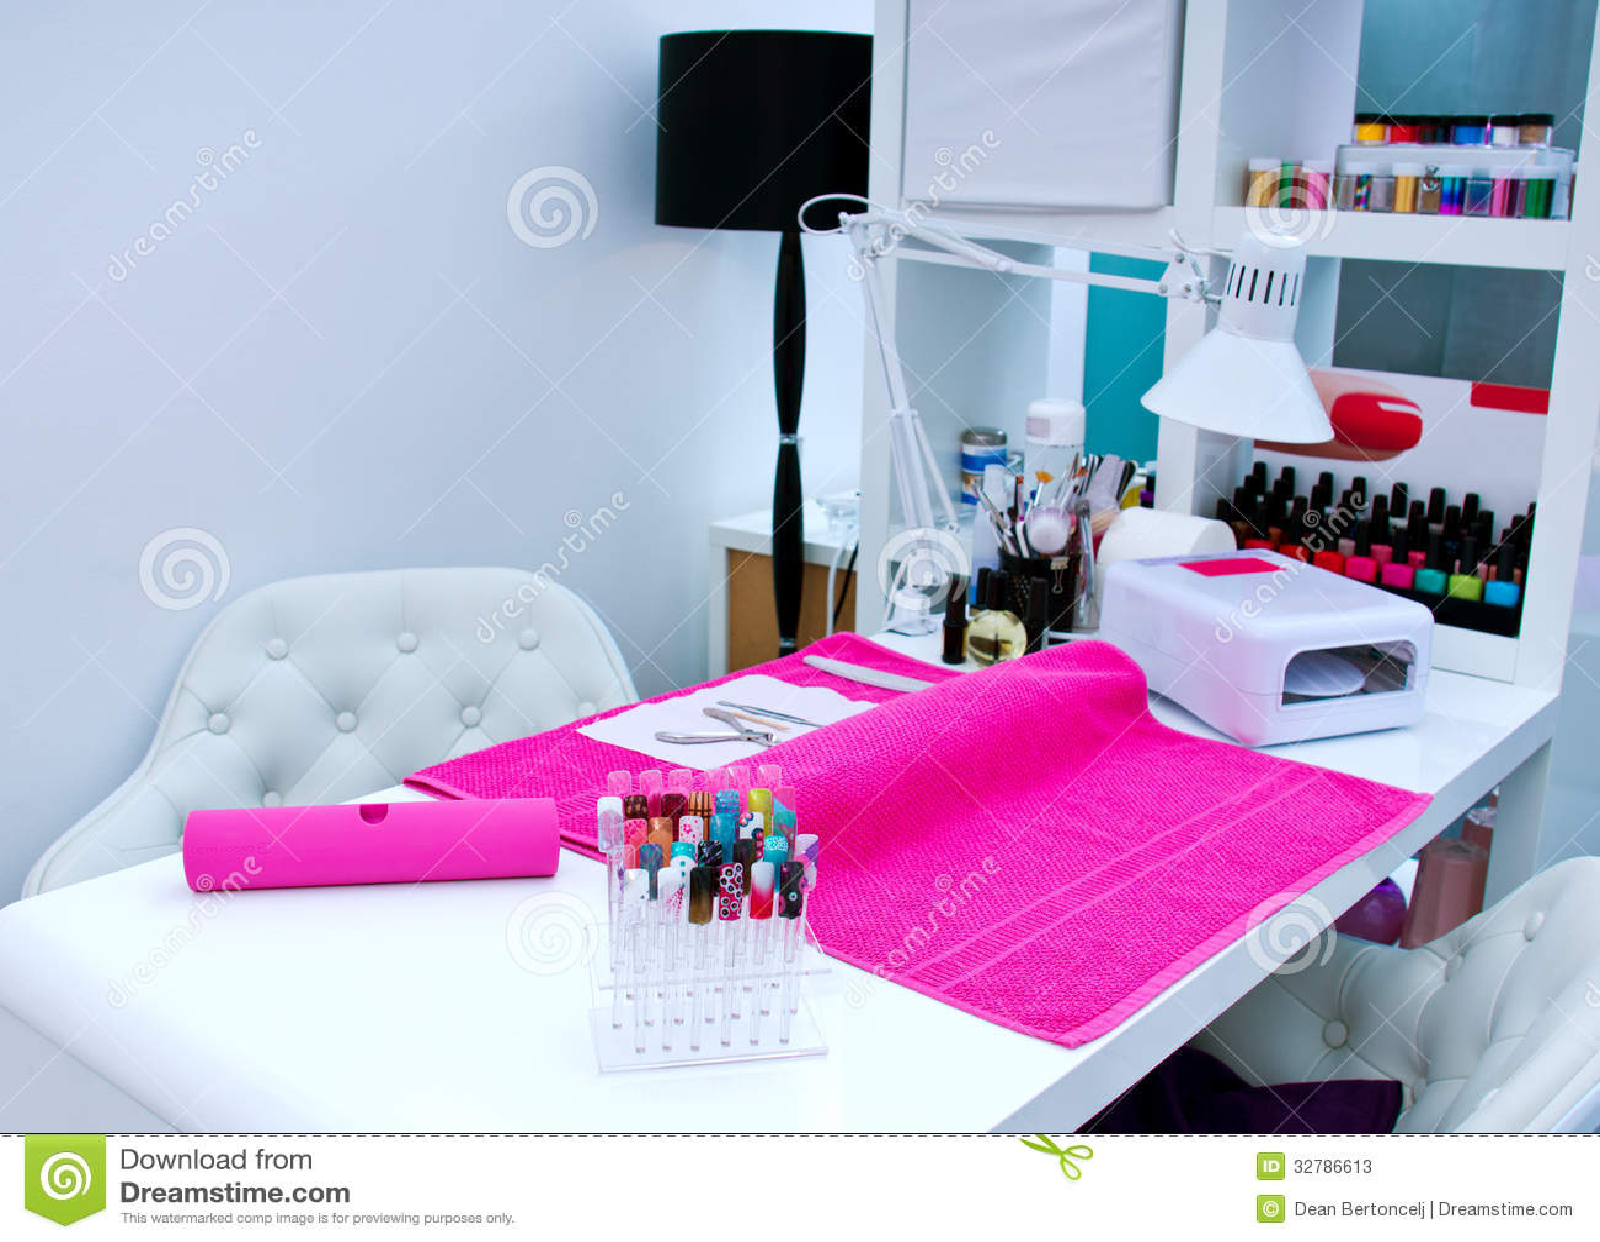 Manicure table stock image. Image of nails, make, fashion - 32786613